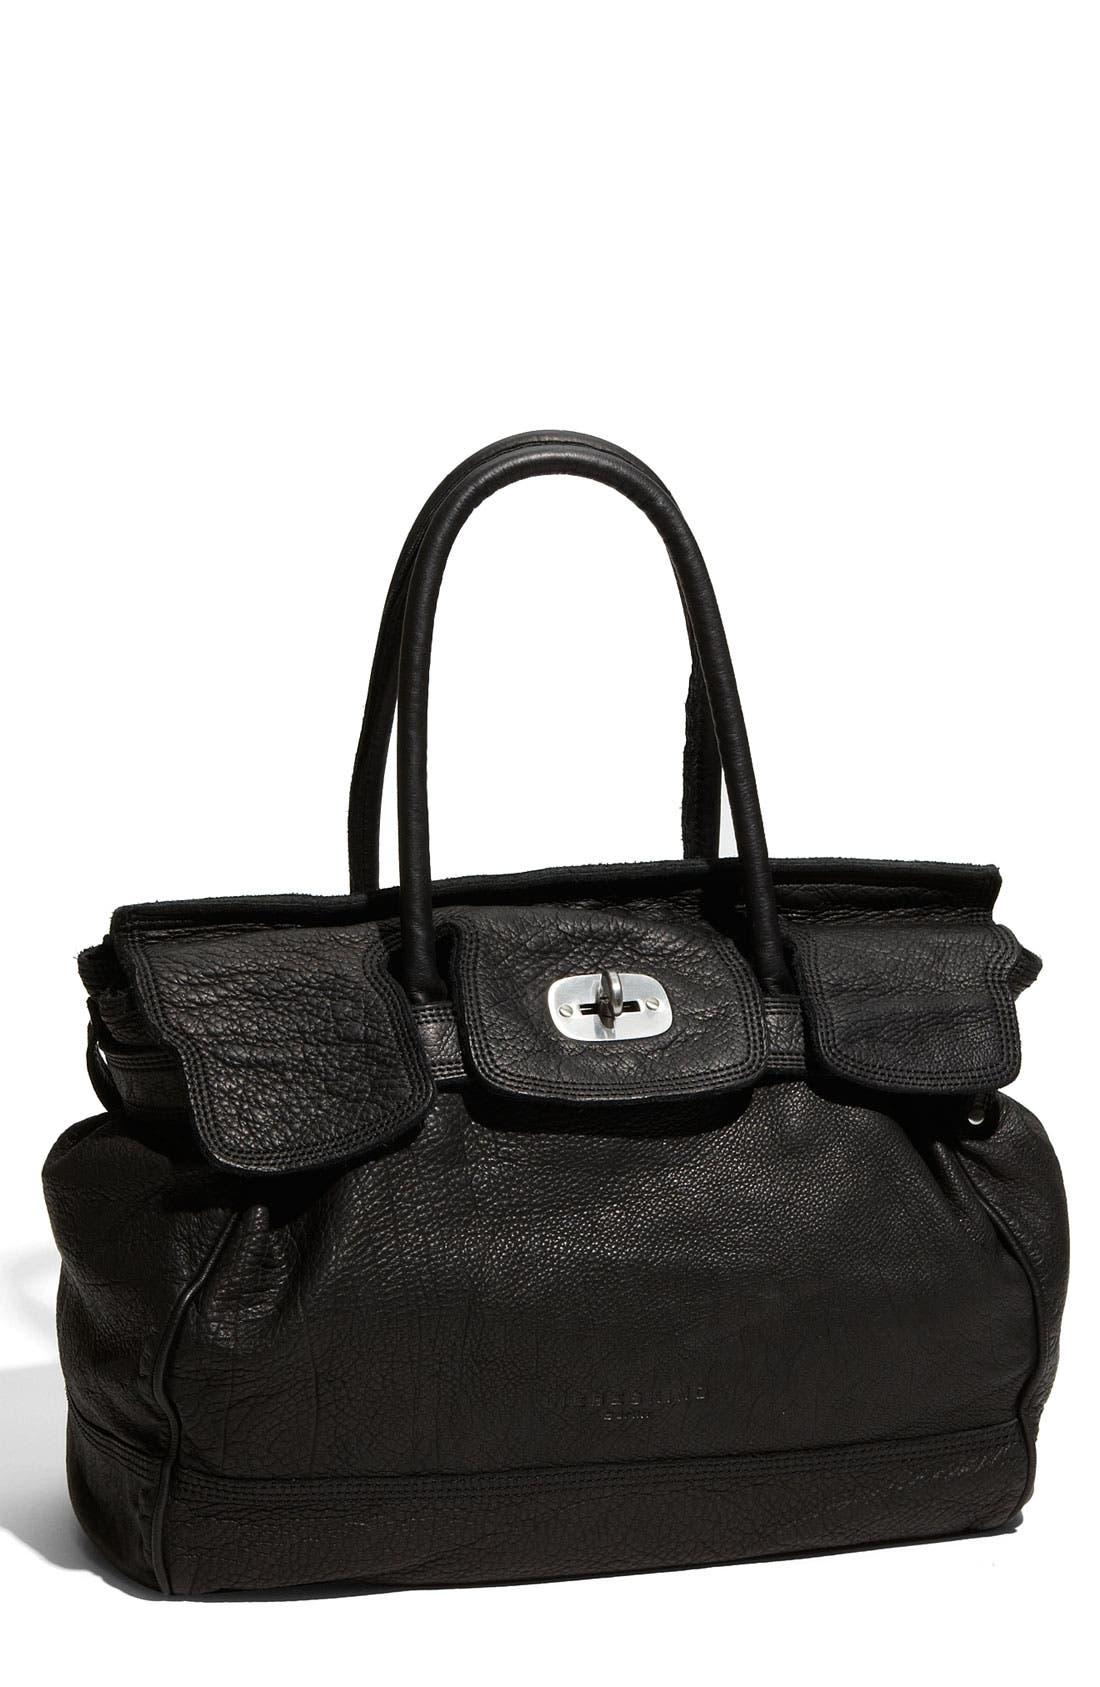 LIEBESKIND, 'Mia - Large' Soft Leather Satchel, Main thumbnail 1, color, 001